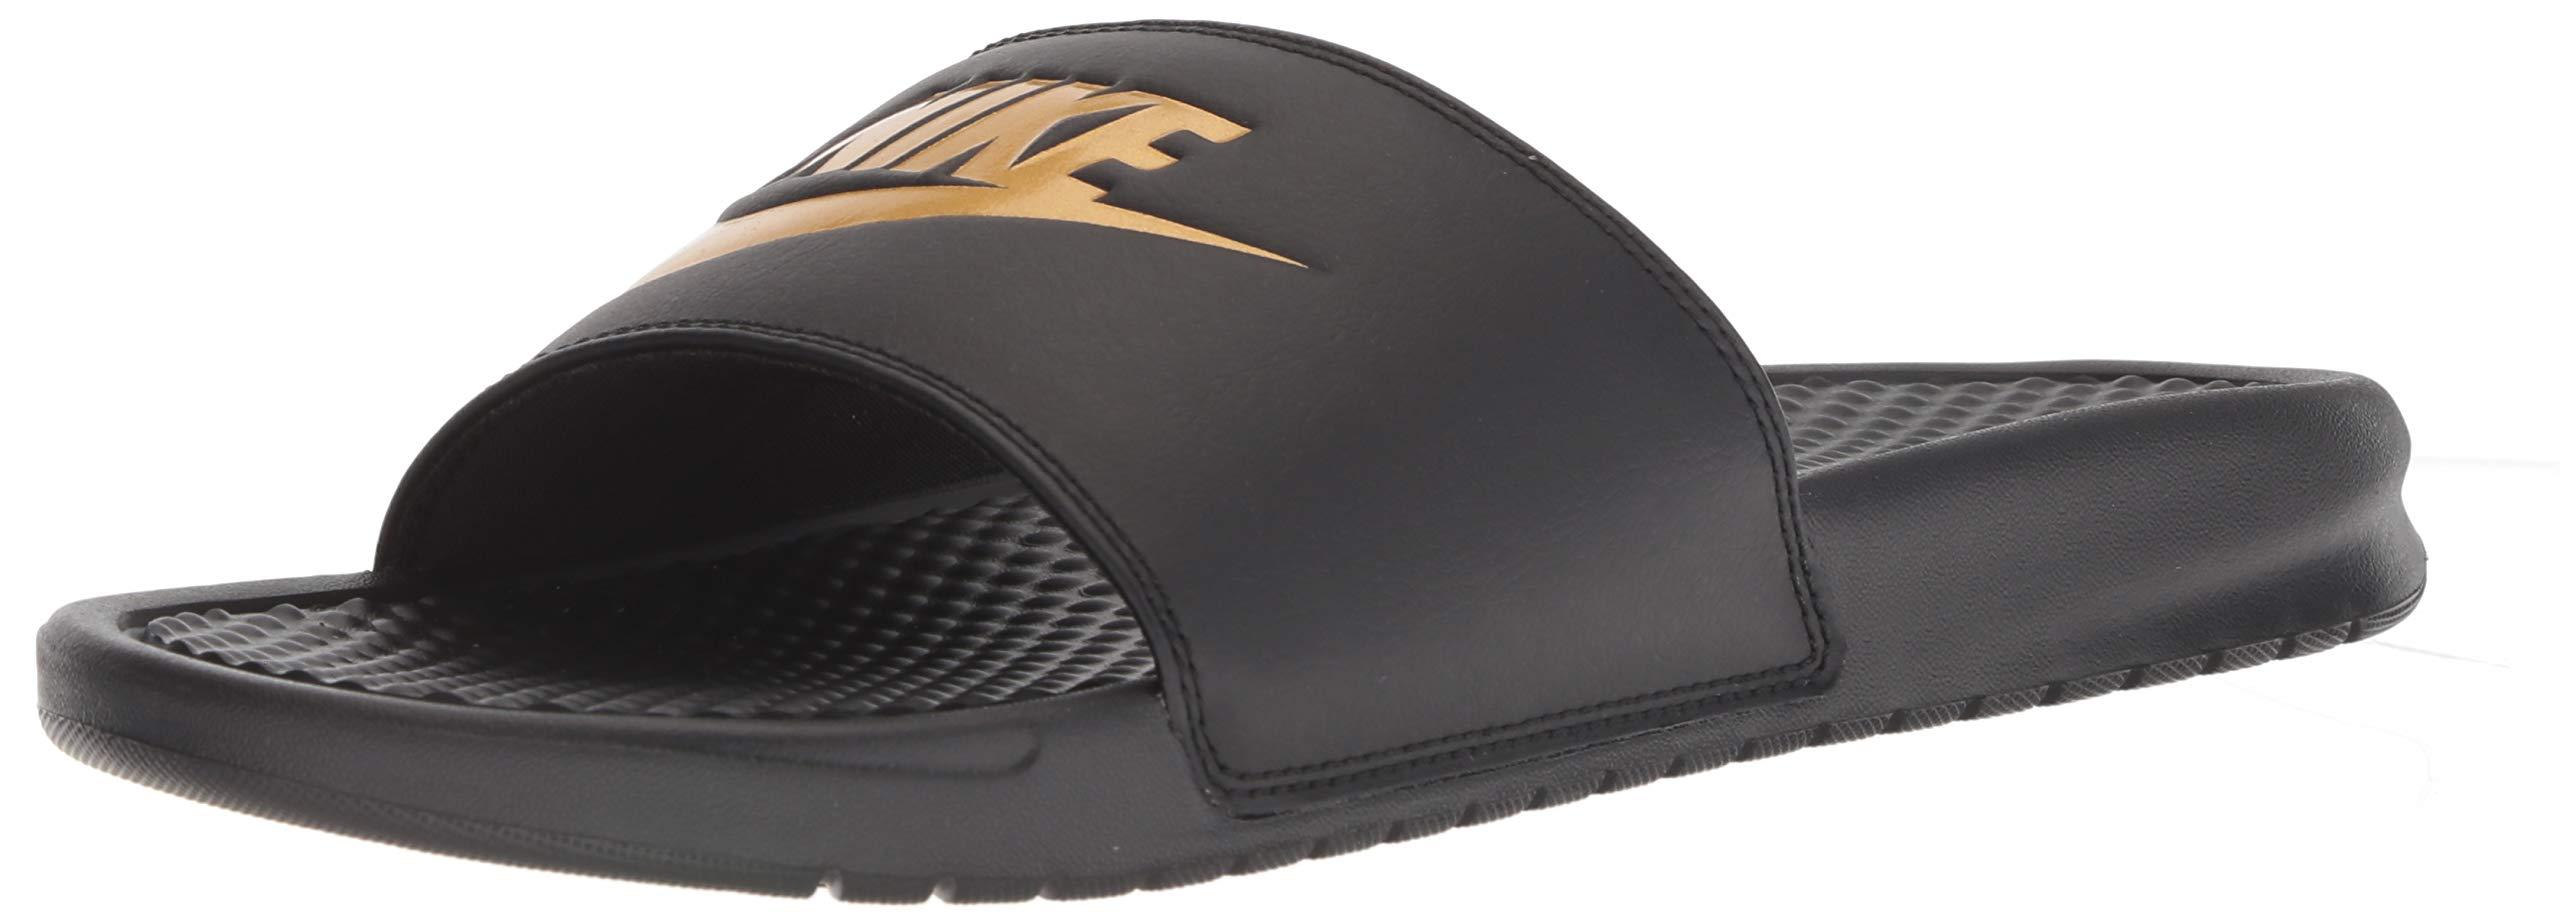 Nike Men's Benassi Just Do It Athletic Sandal, Black/Metallic Gold, 7 Regular US